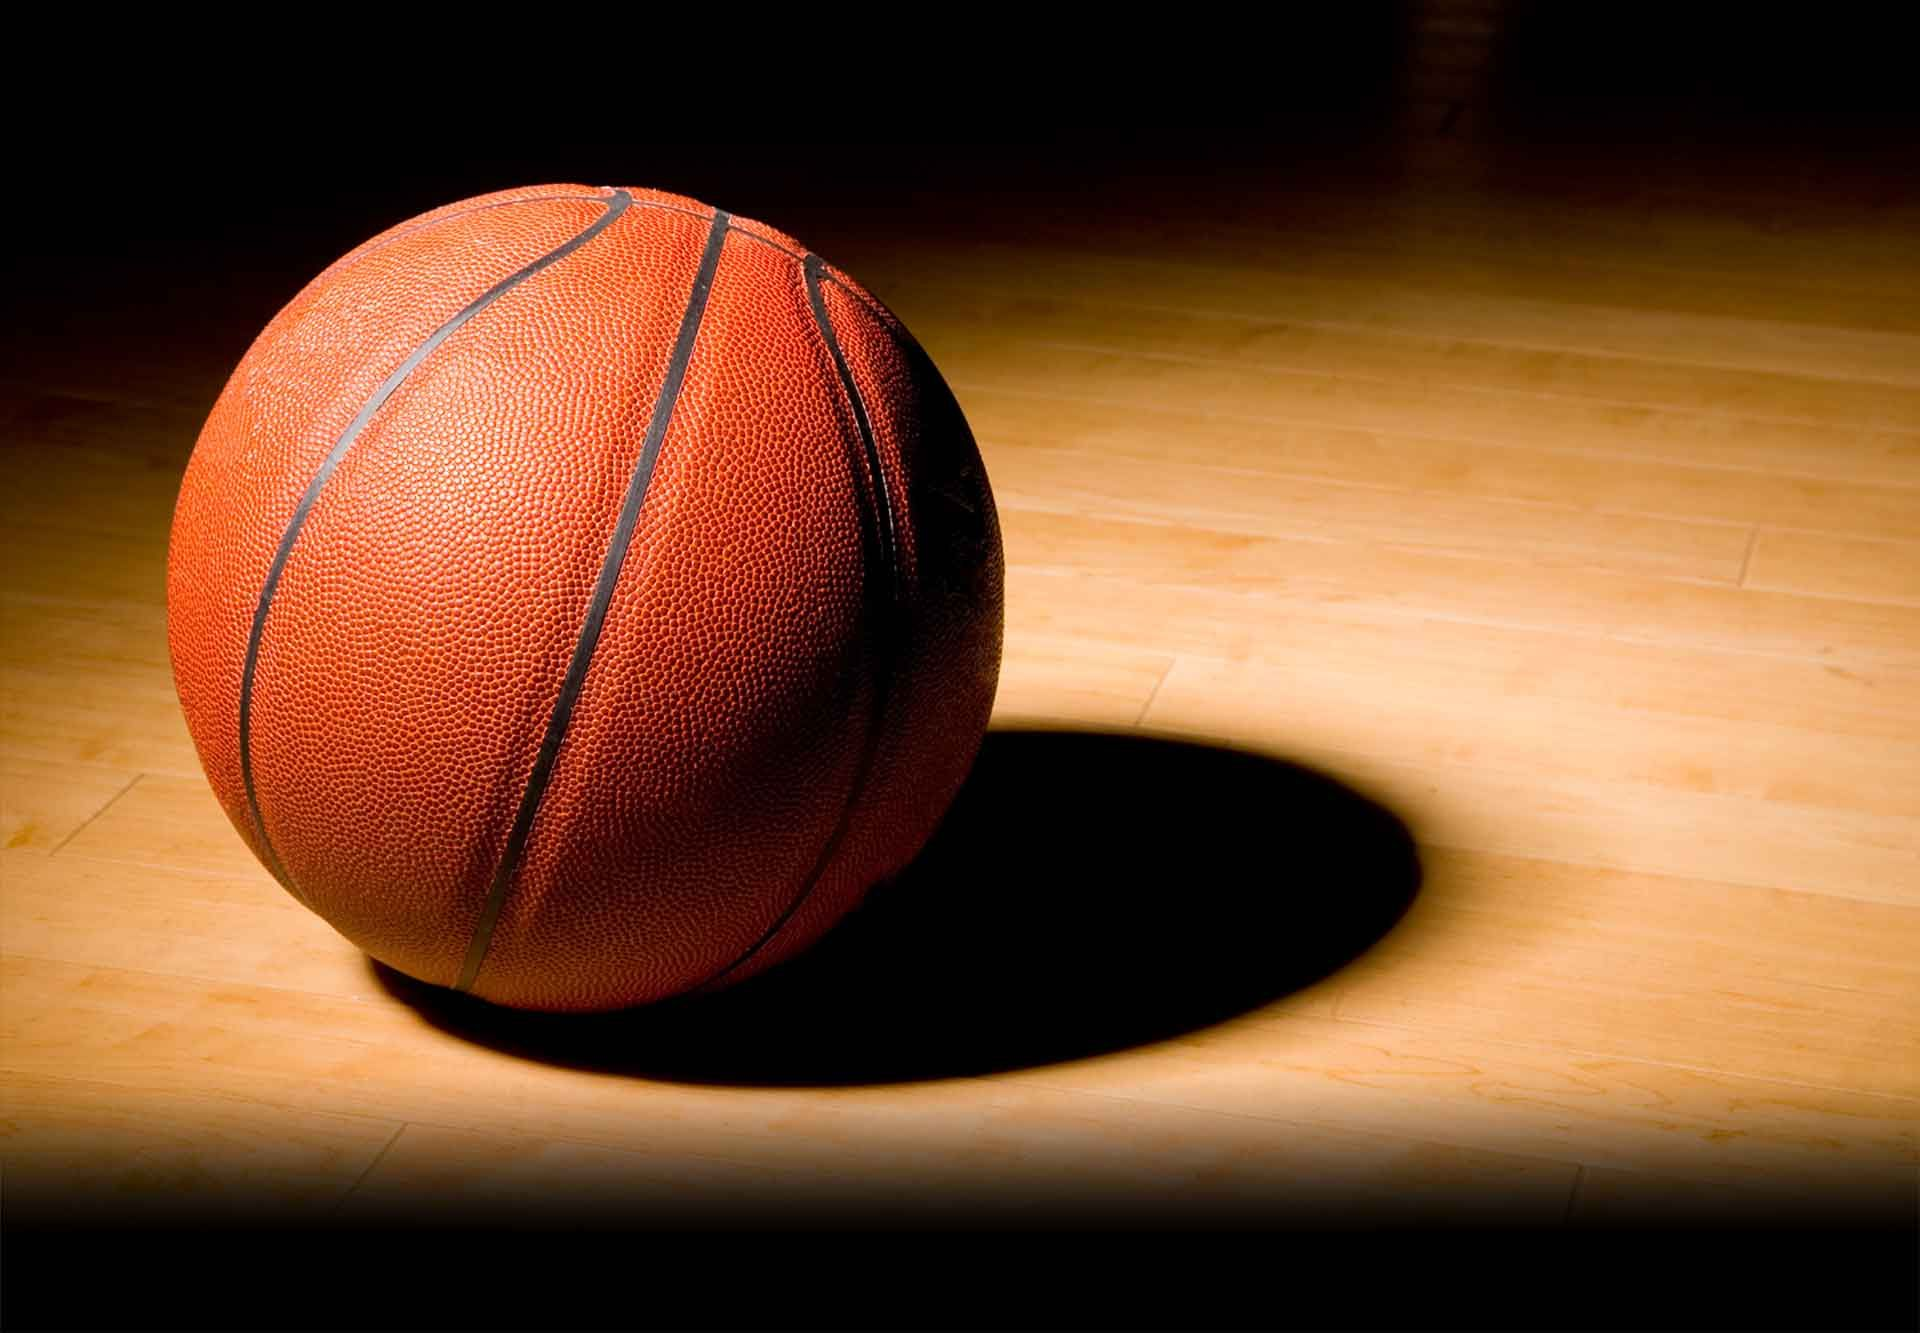 Basketball Background Images Hd Palla